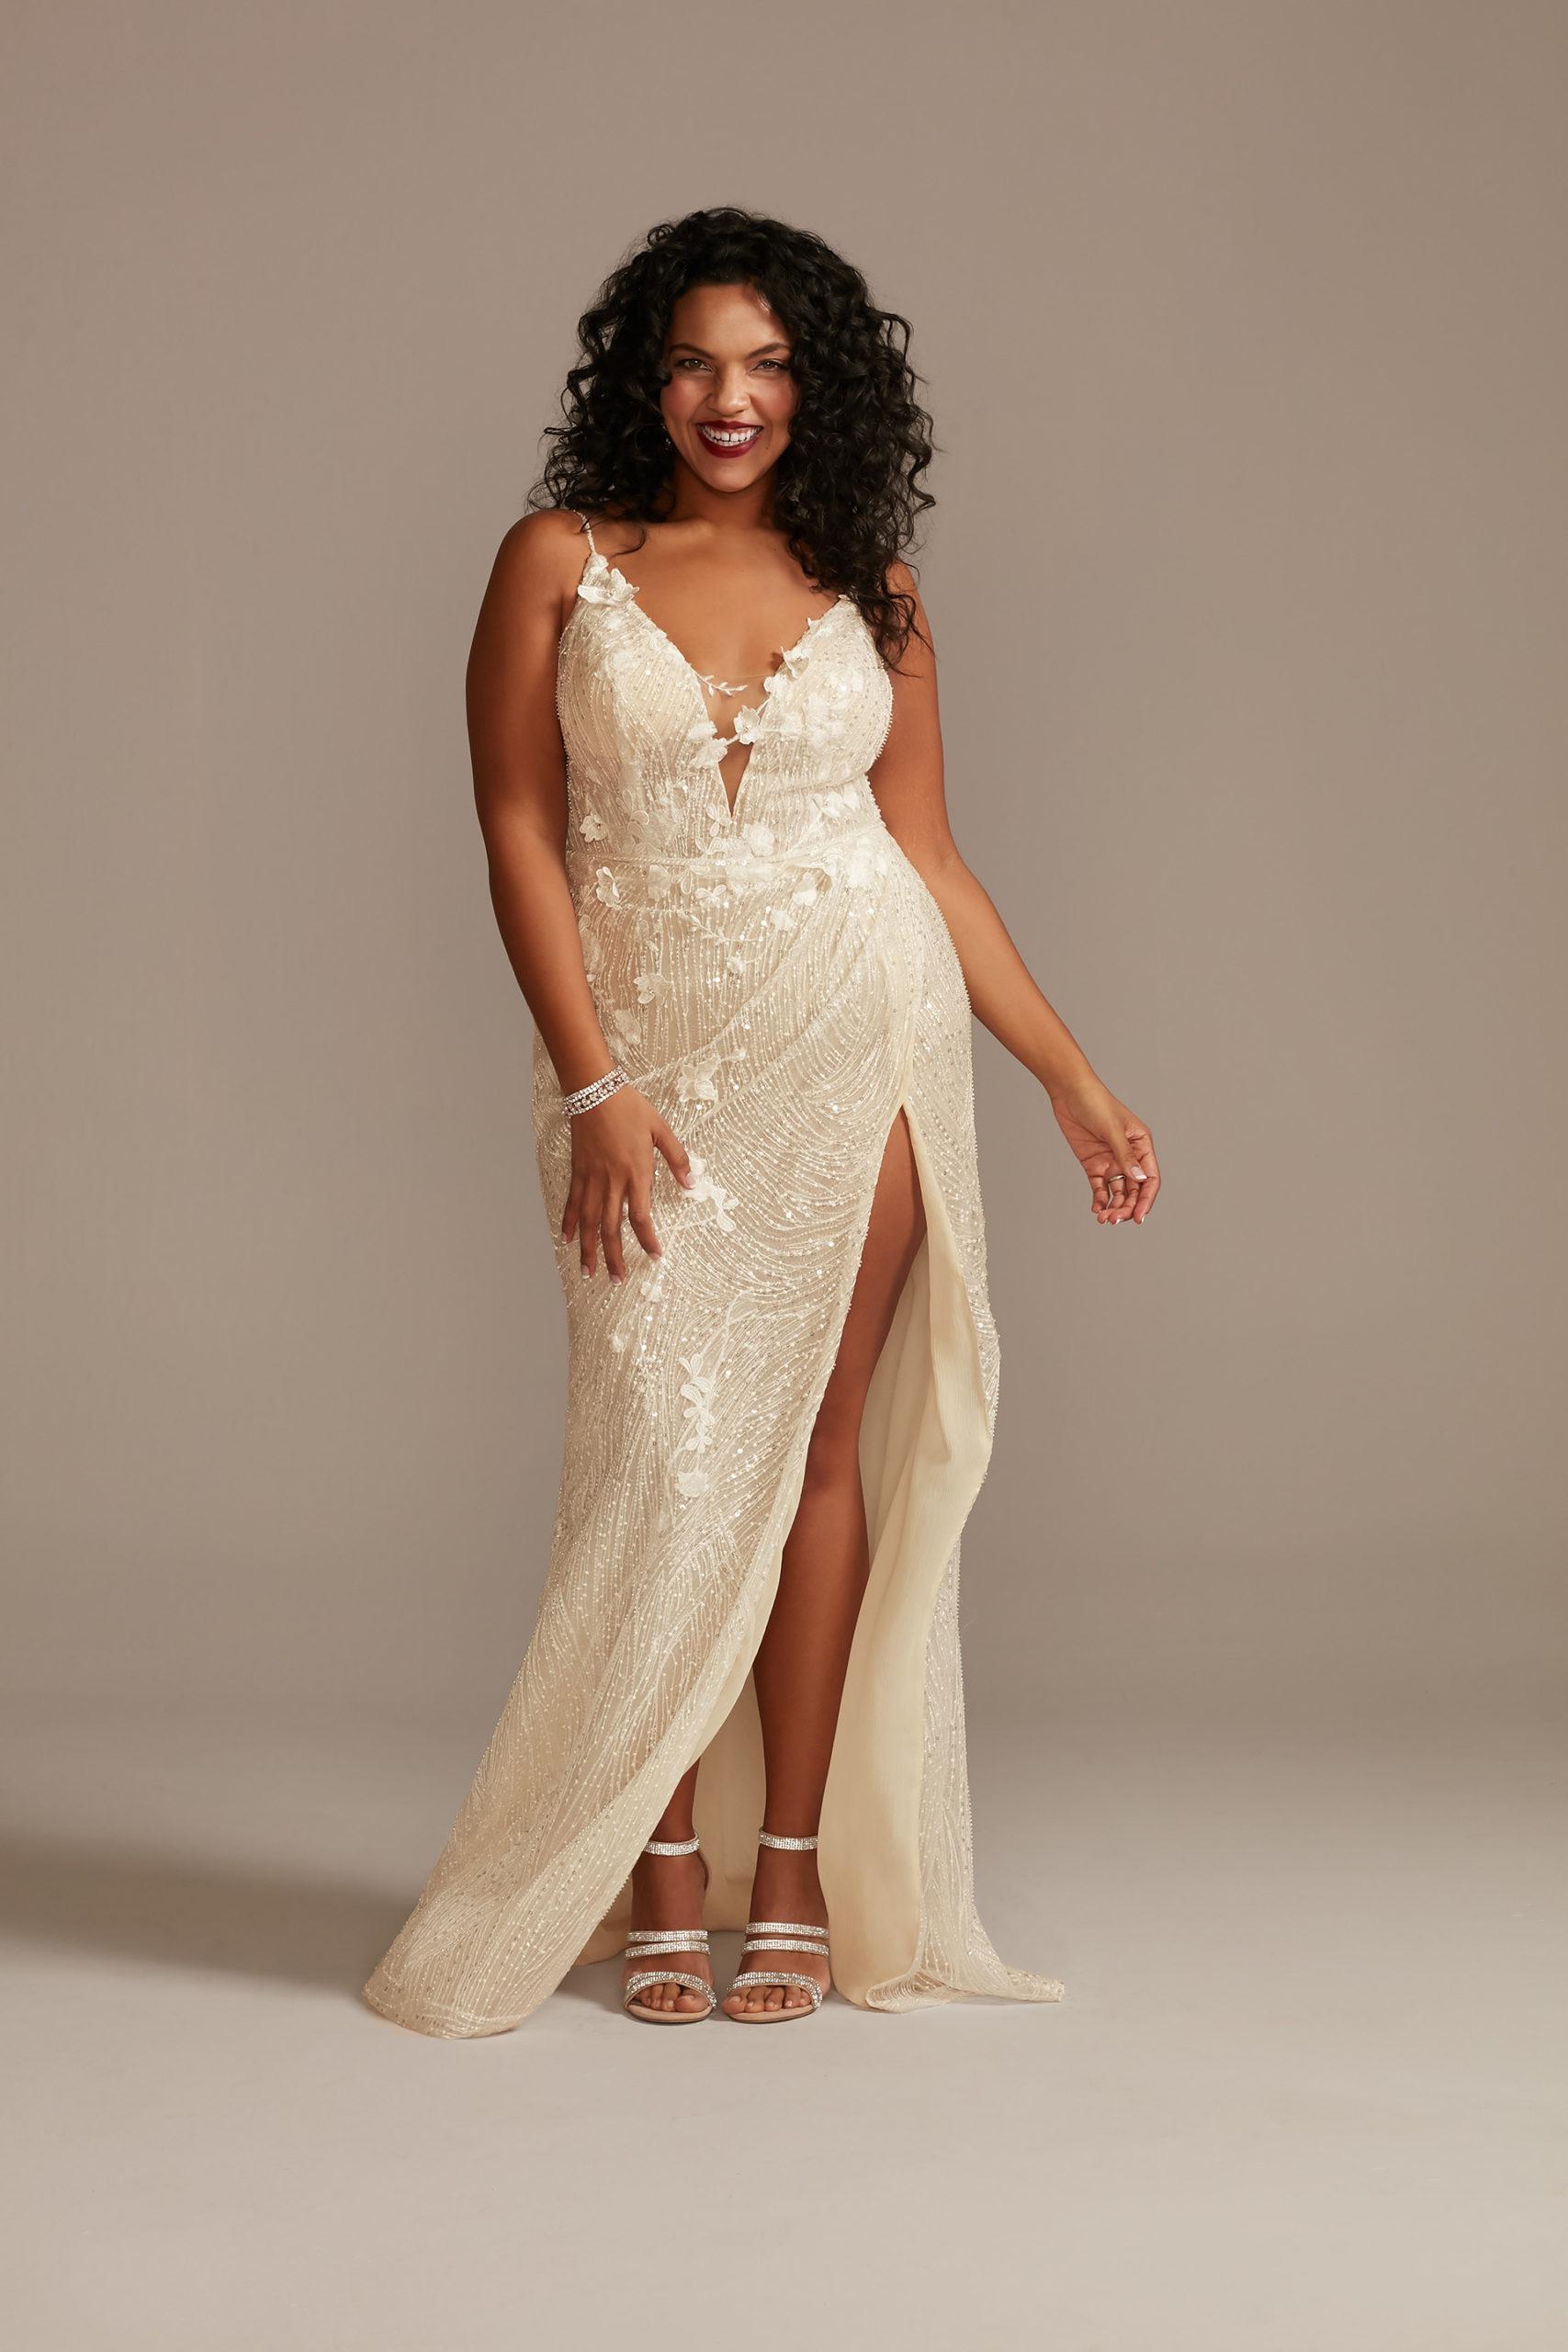 bride wearing Beaded Plunge Wedding Dress with High Slit